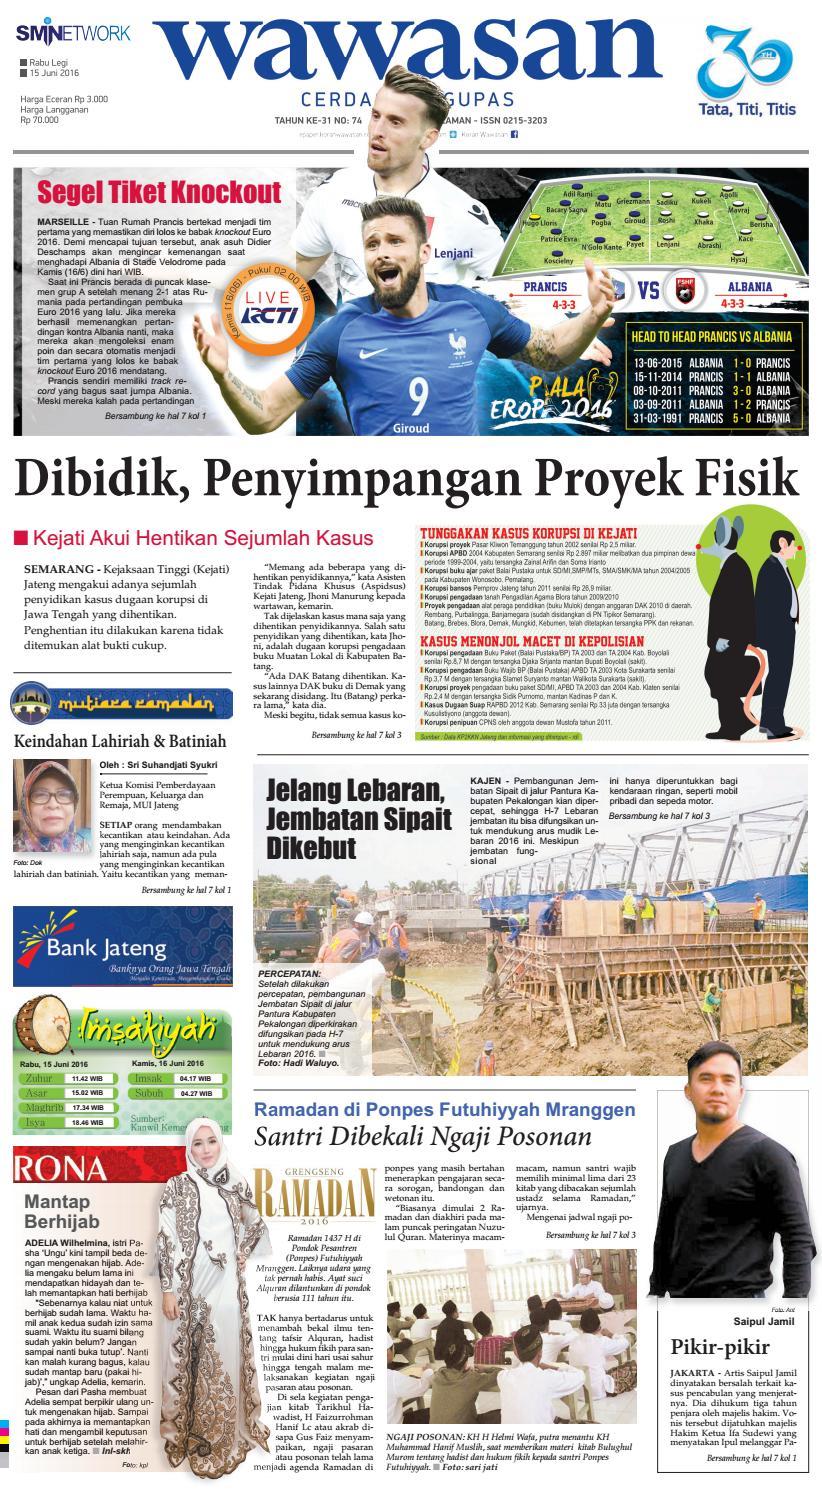 Wawasan 15 Juni 2016 By Koran Pagi Issuu Produk Ukm Bumn Sajadah Anak Laki